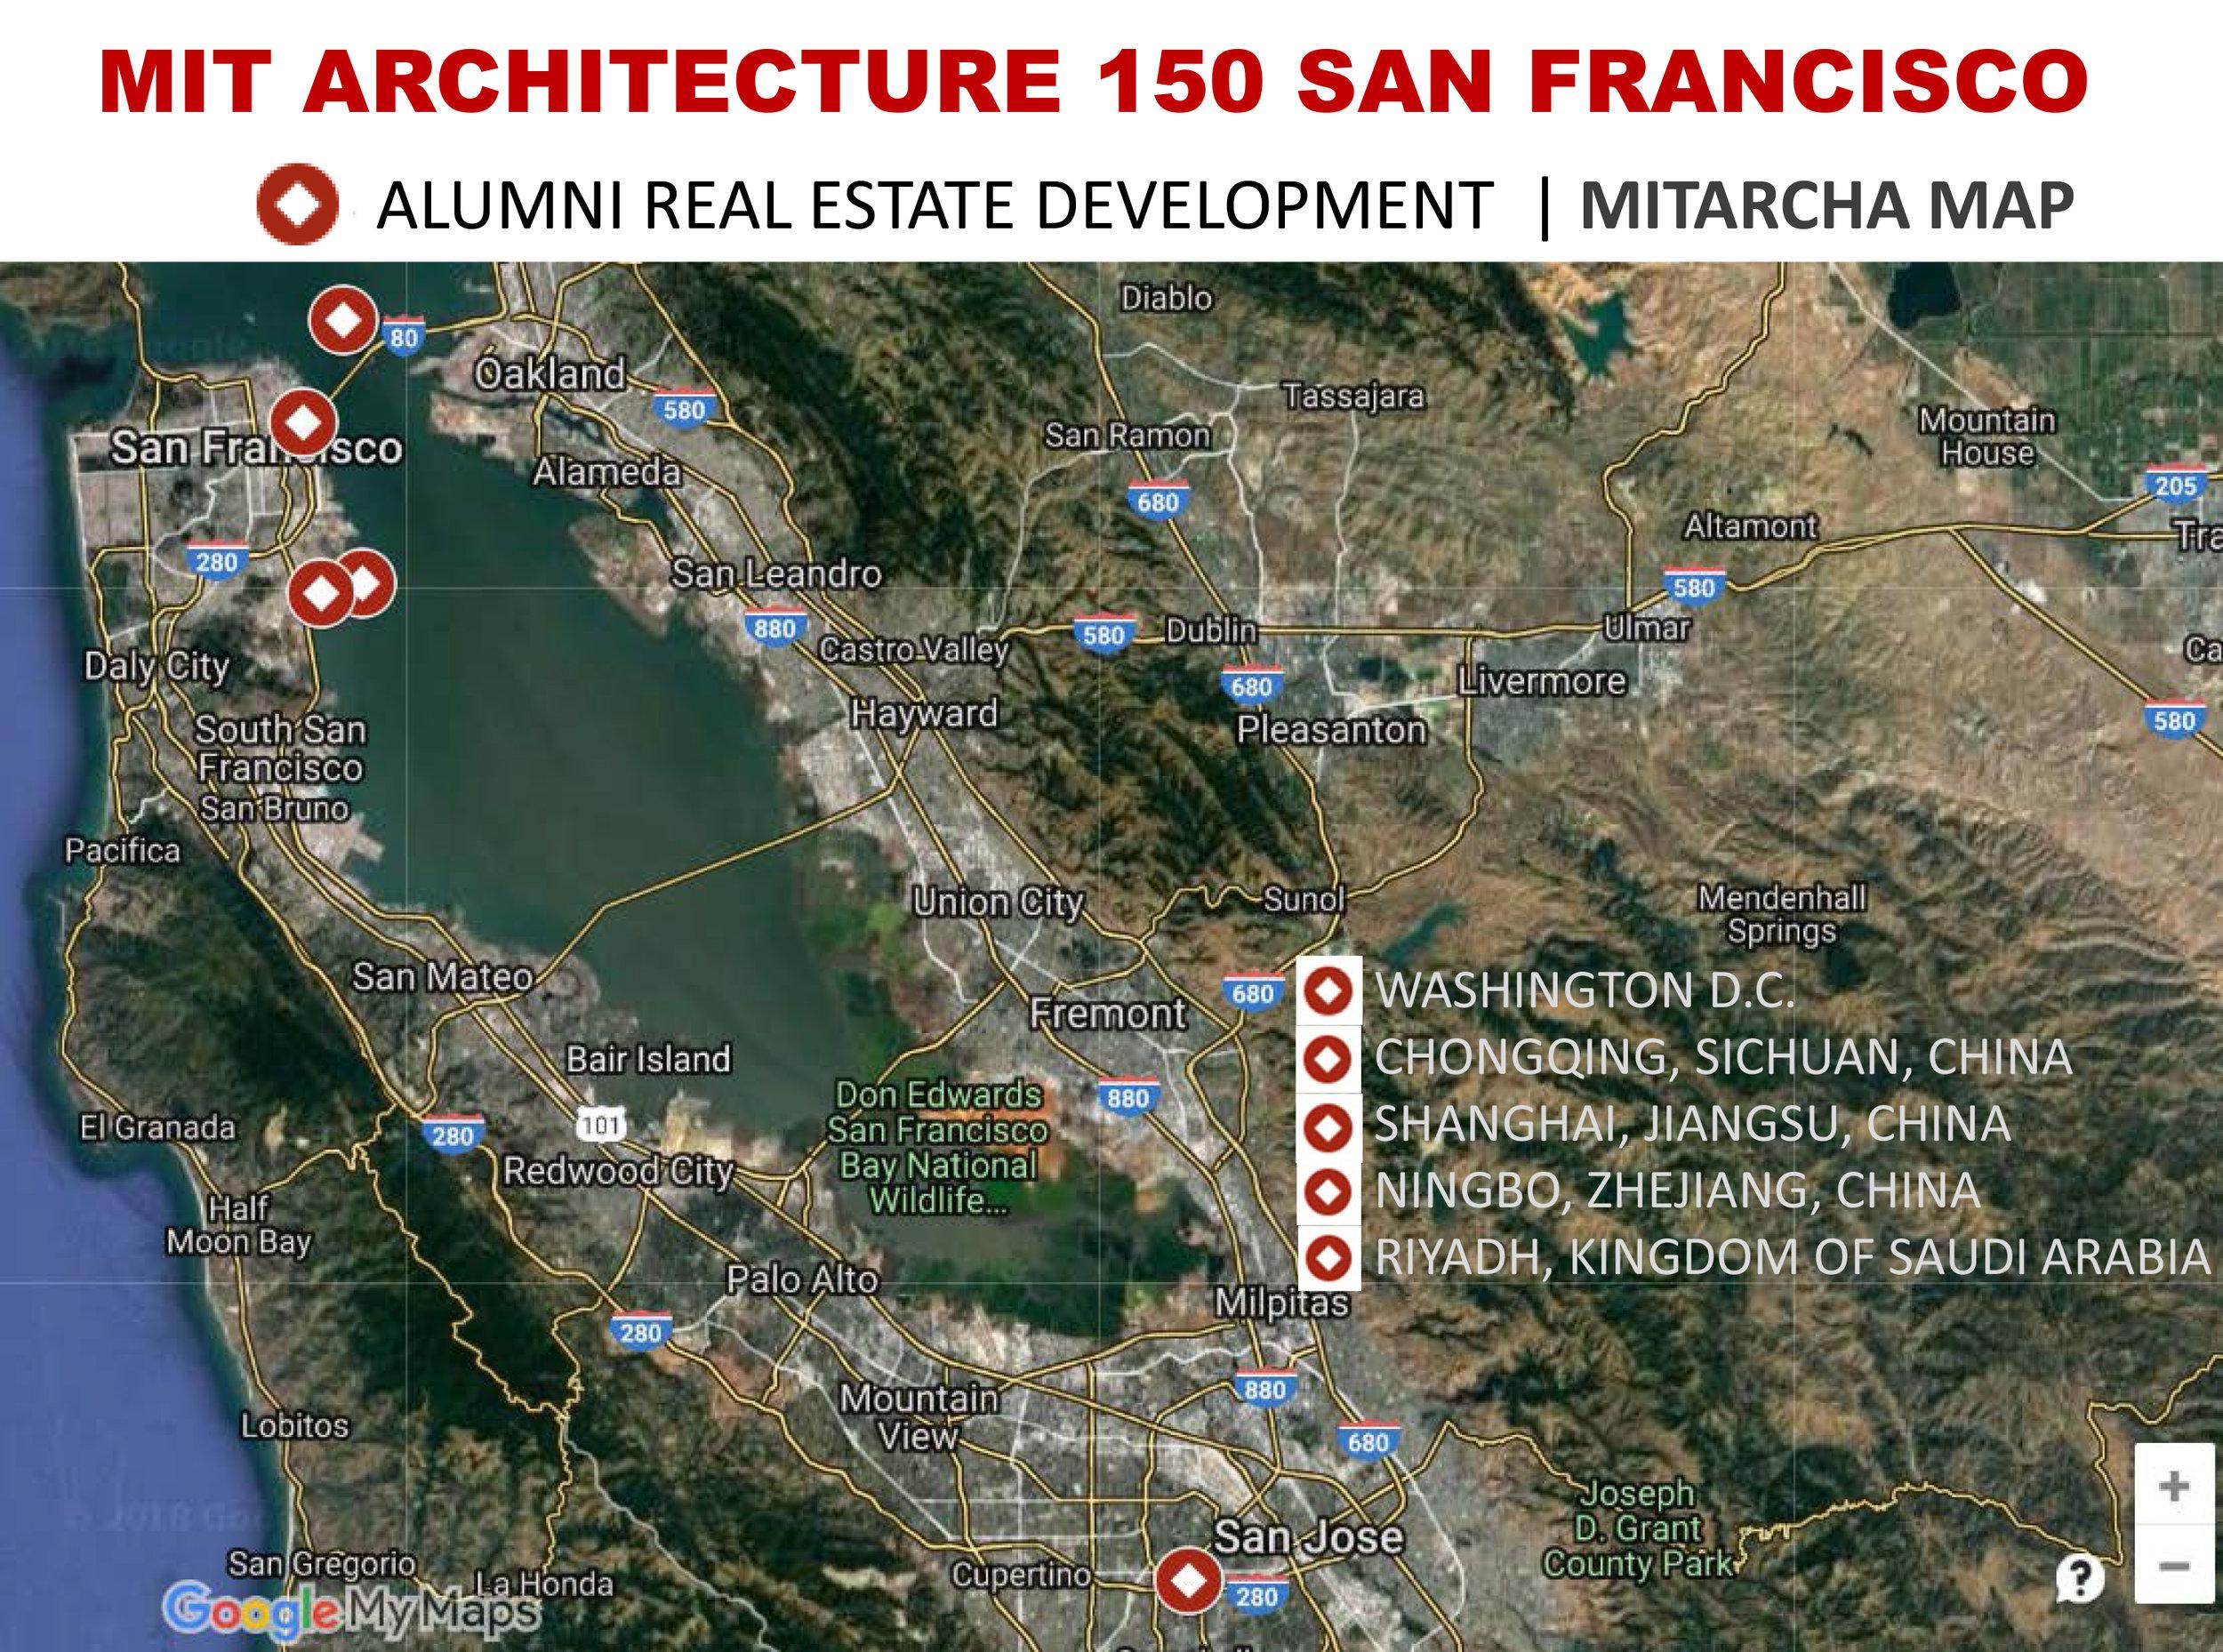 MIT ARCHITECTURE 150 SAN FRANCISCO SLIDESHOW-109 copy.jpg